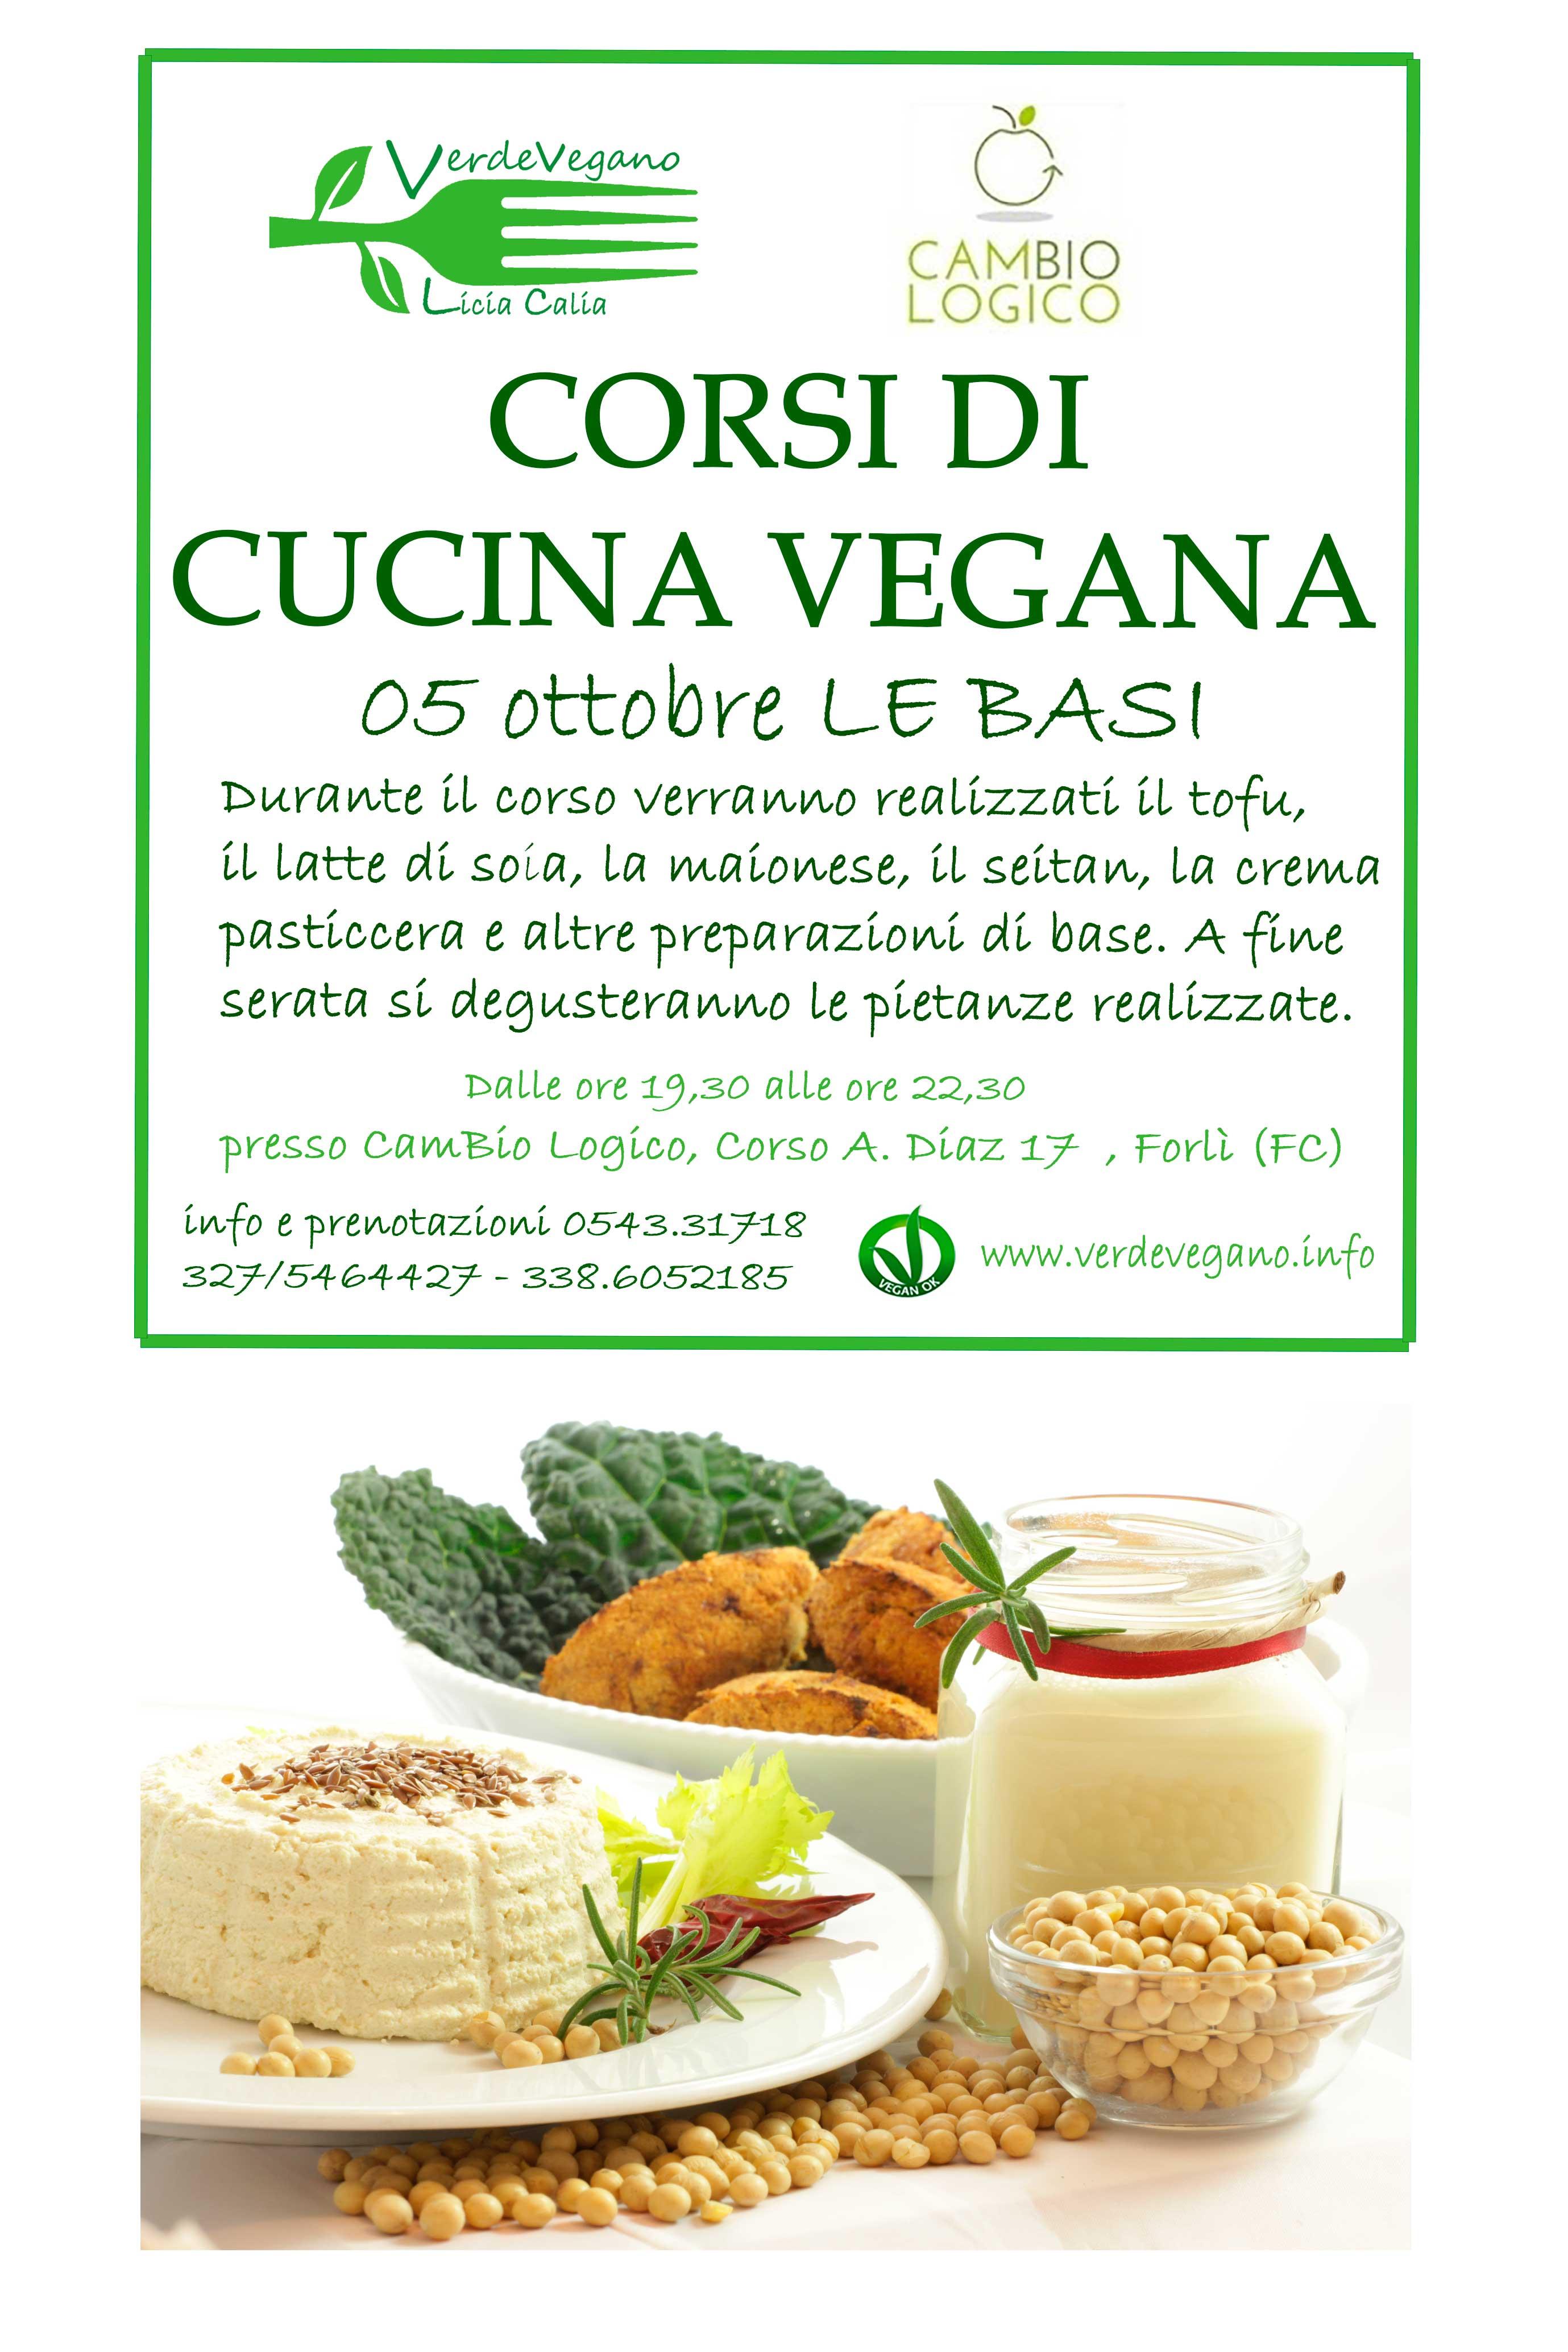 corso di cucina vegana | verdevegano.info - Corso Cucina Vegetariana